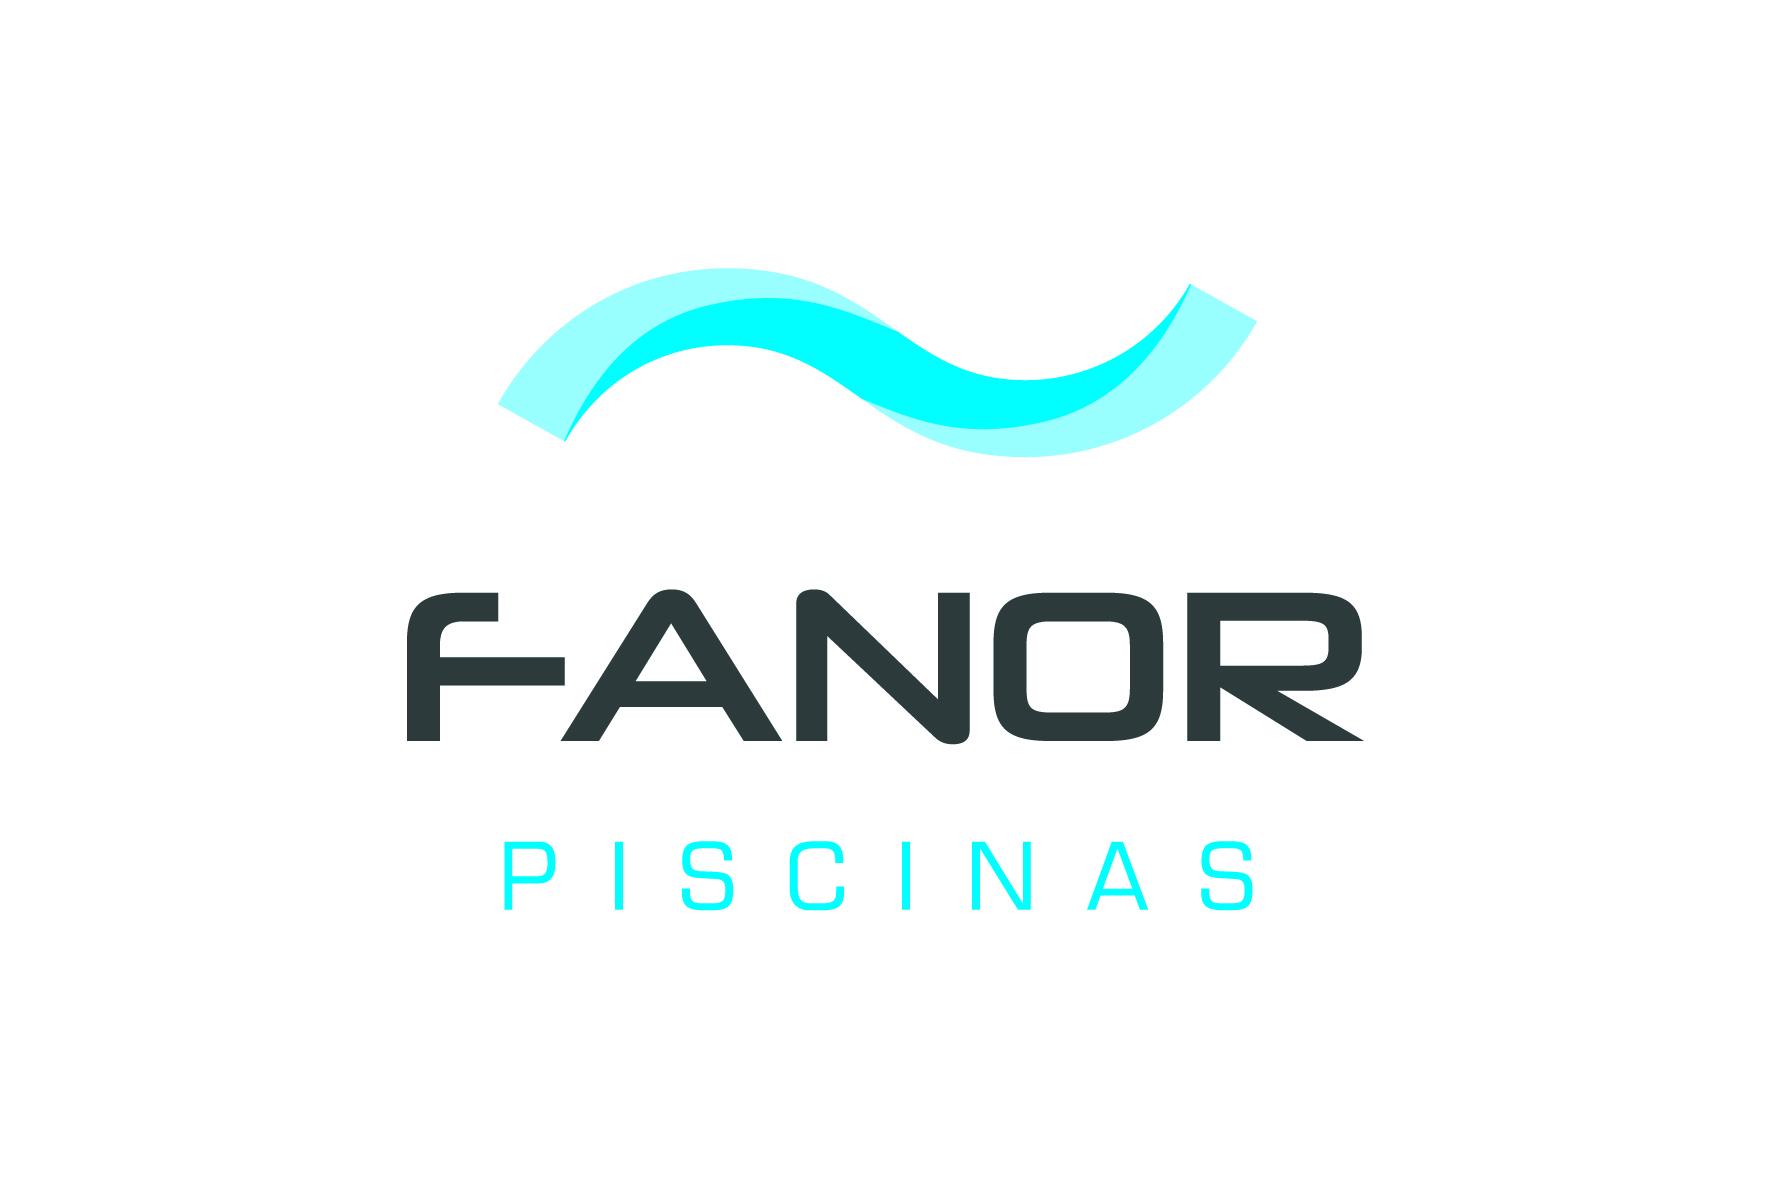 Fanor